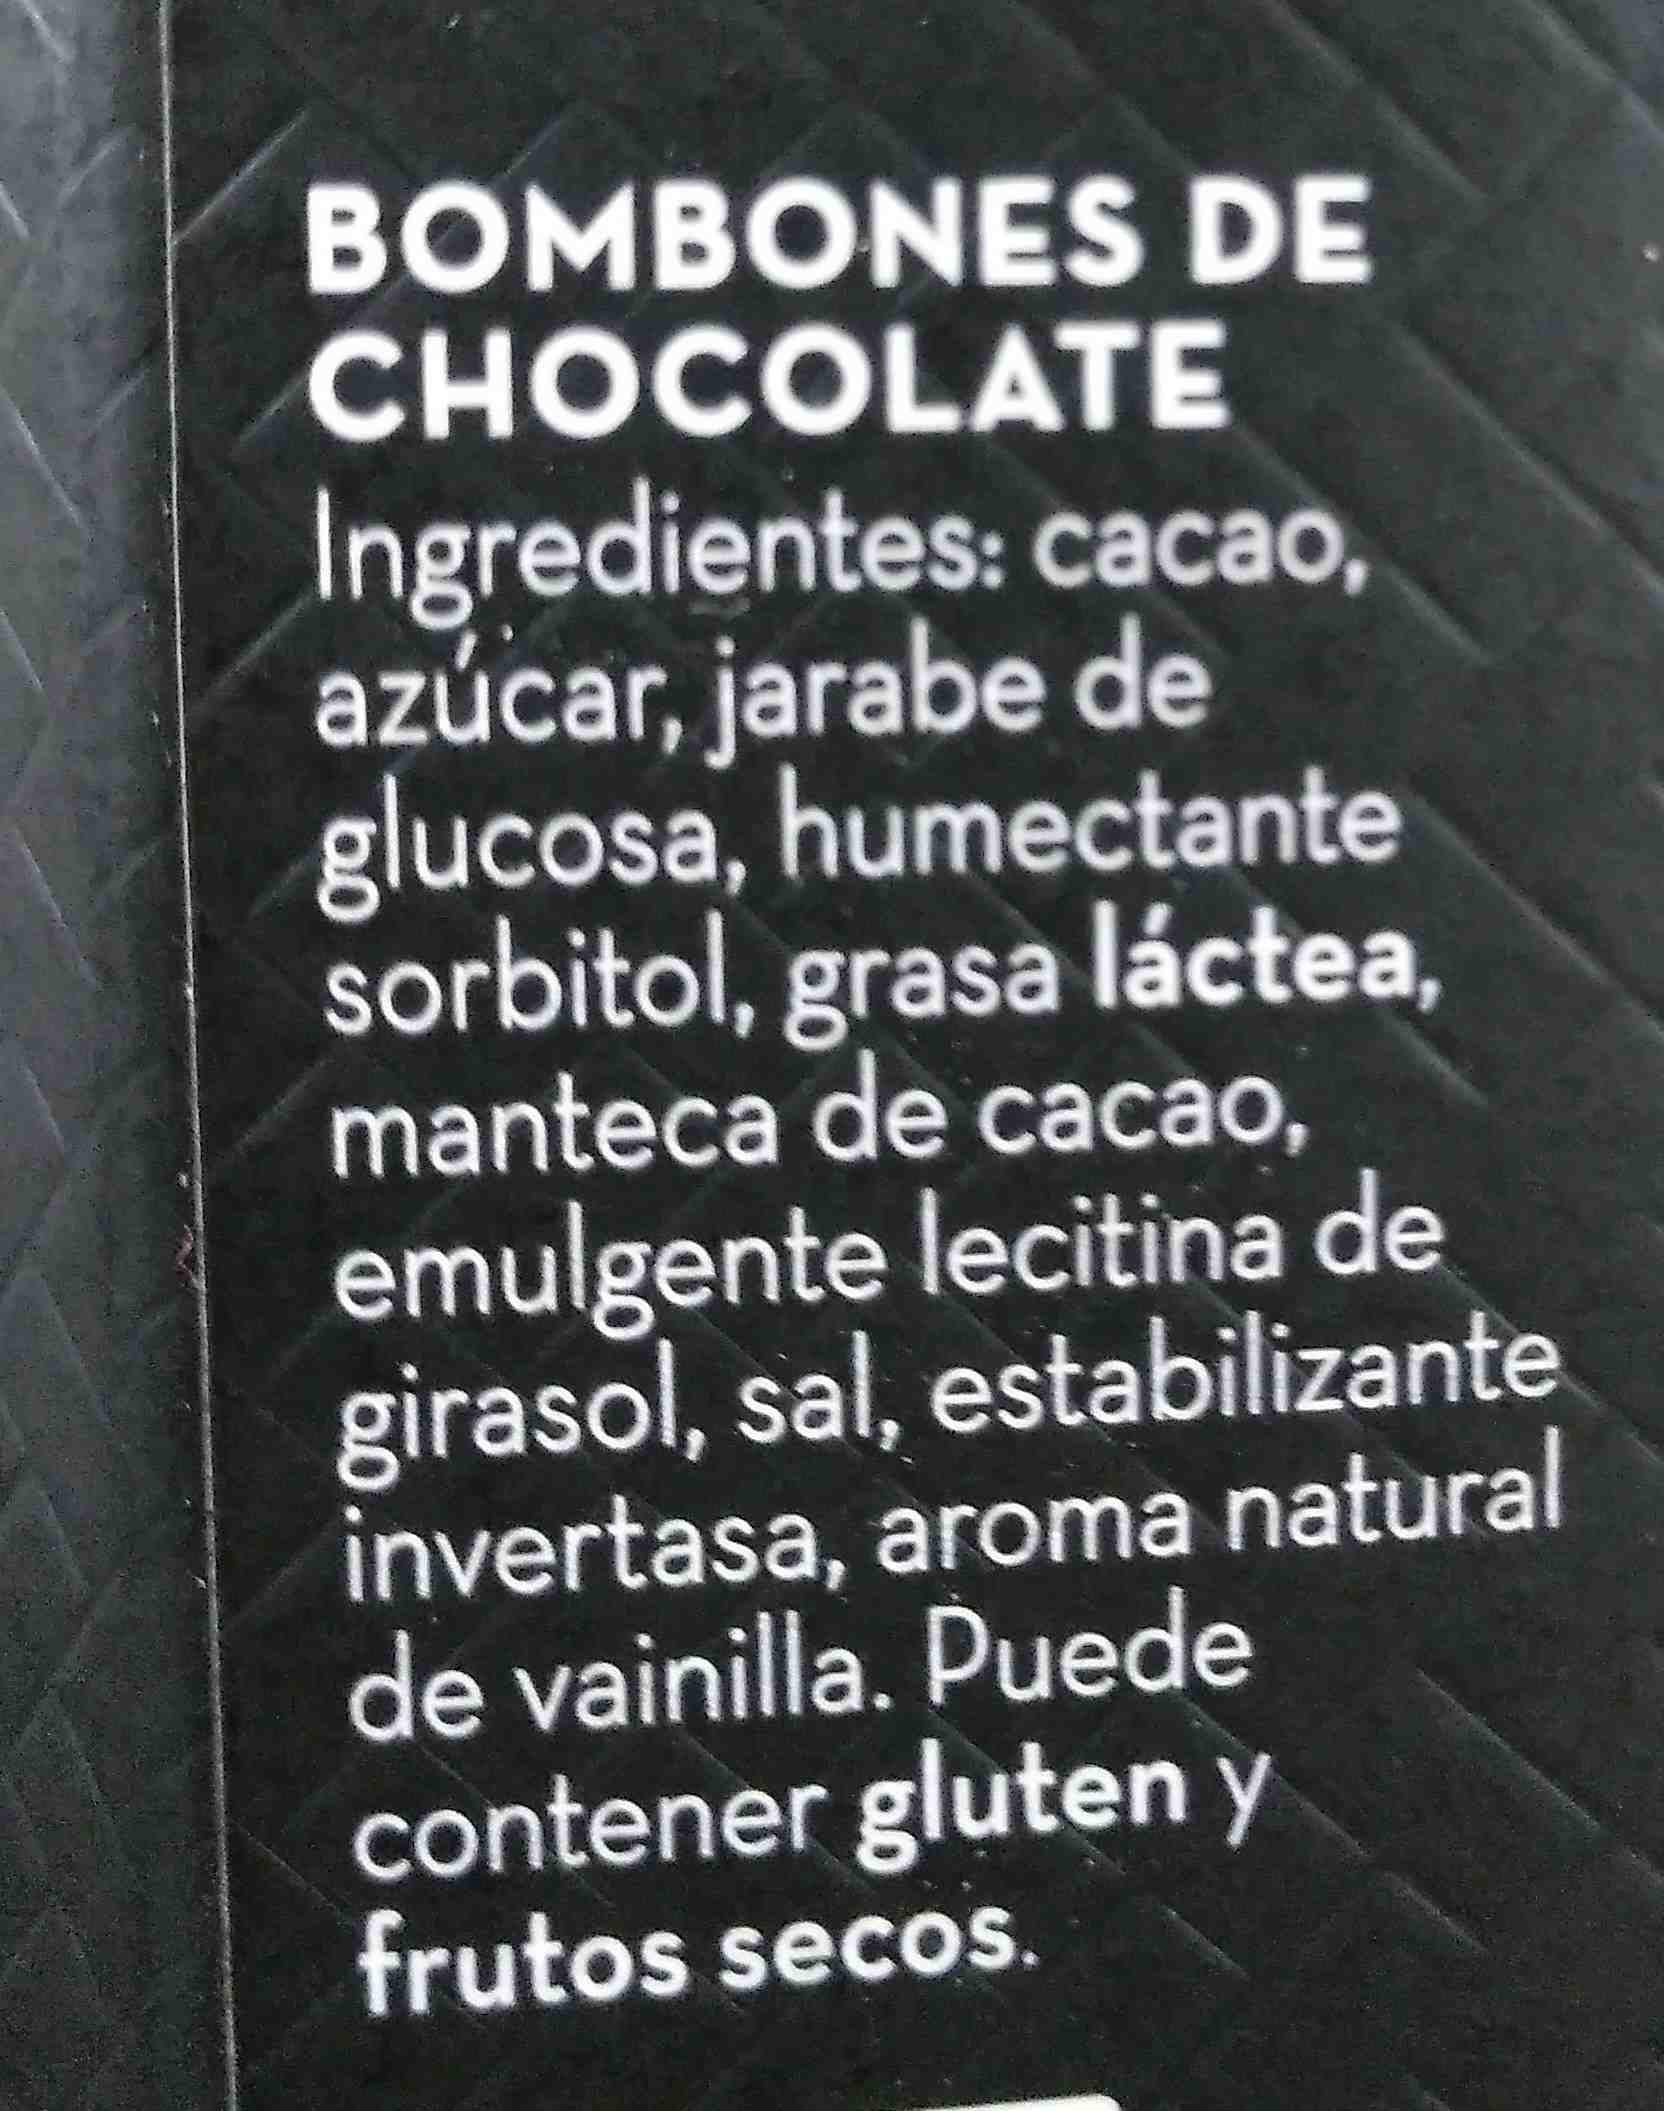 Bombones chocolate negro premium caja roja - Ingredients - es